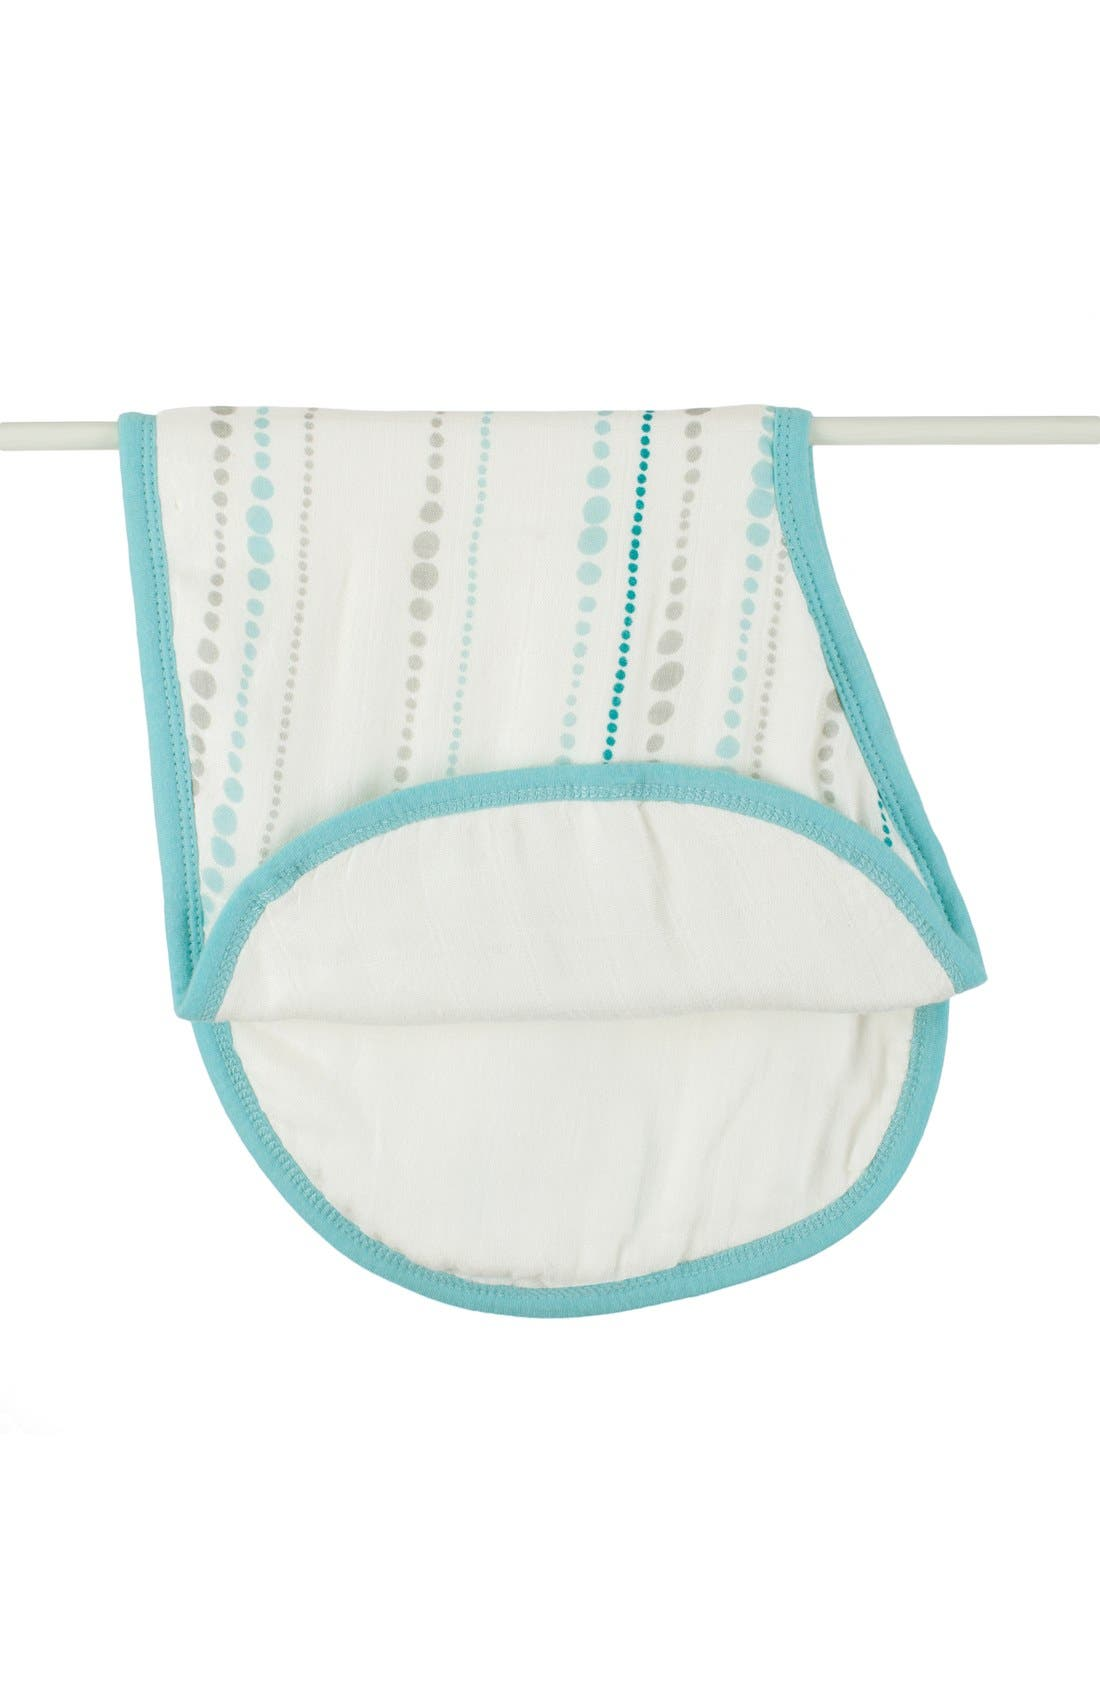 Burpy Bib<sup>®</sup> Burp Cloth & Bib,                         Main,                         color, 400